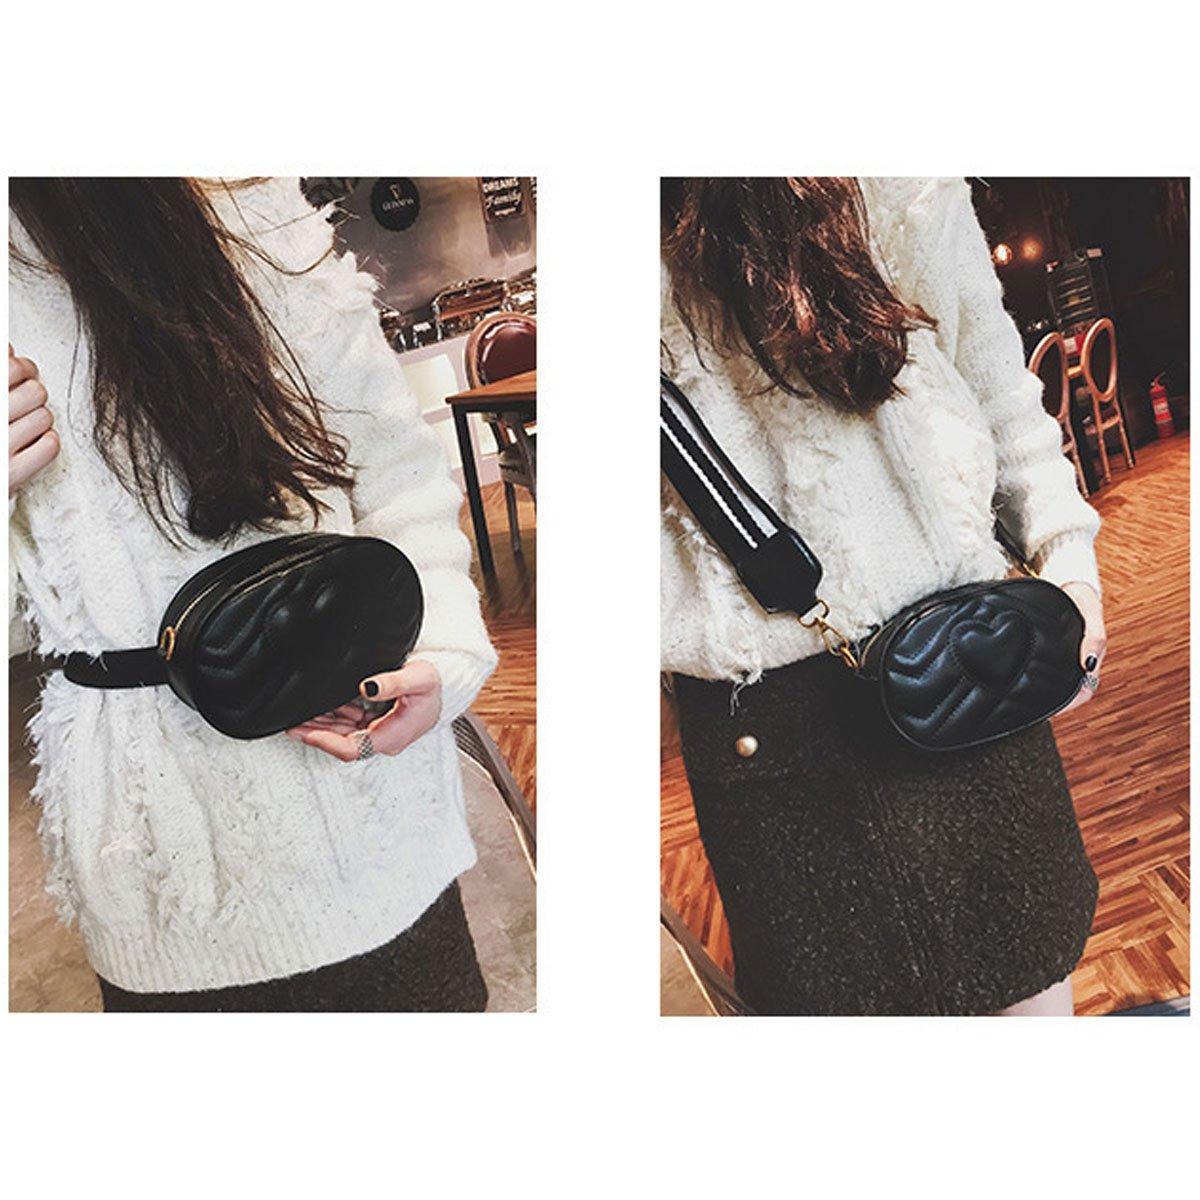 Mily Fashion Women Elegant PU Leather Waist Bag Love Shape Pattern Embroidery Cross Body Bag Fanny Packs by Mily (Image #3)